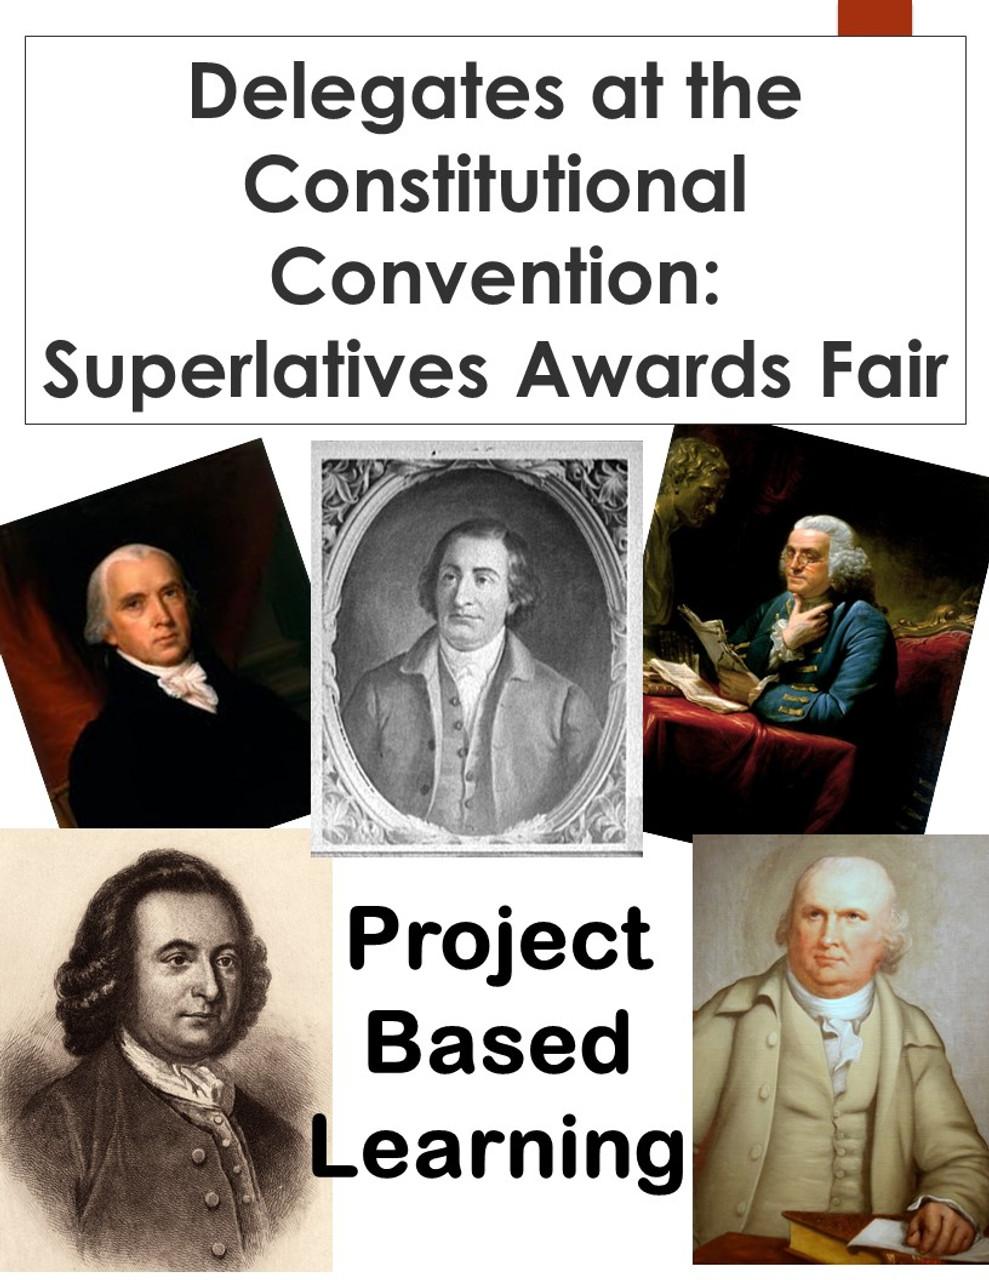 Delegates at the Constitutional Convention: Superlatives Awards Fair